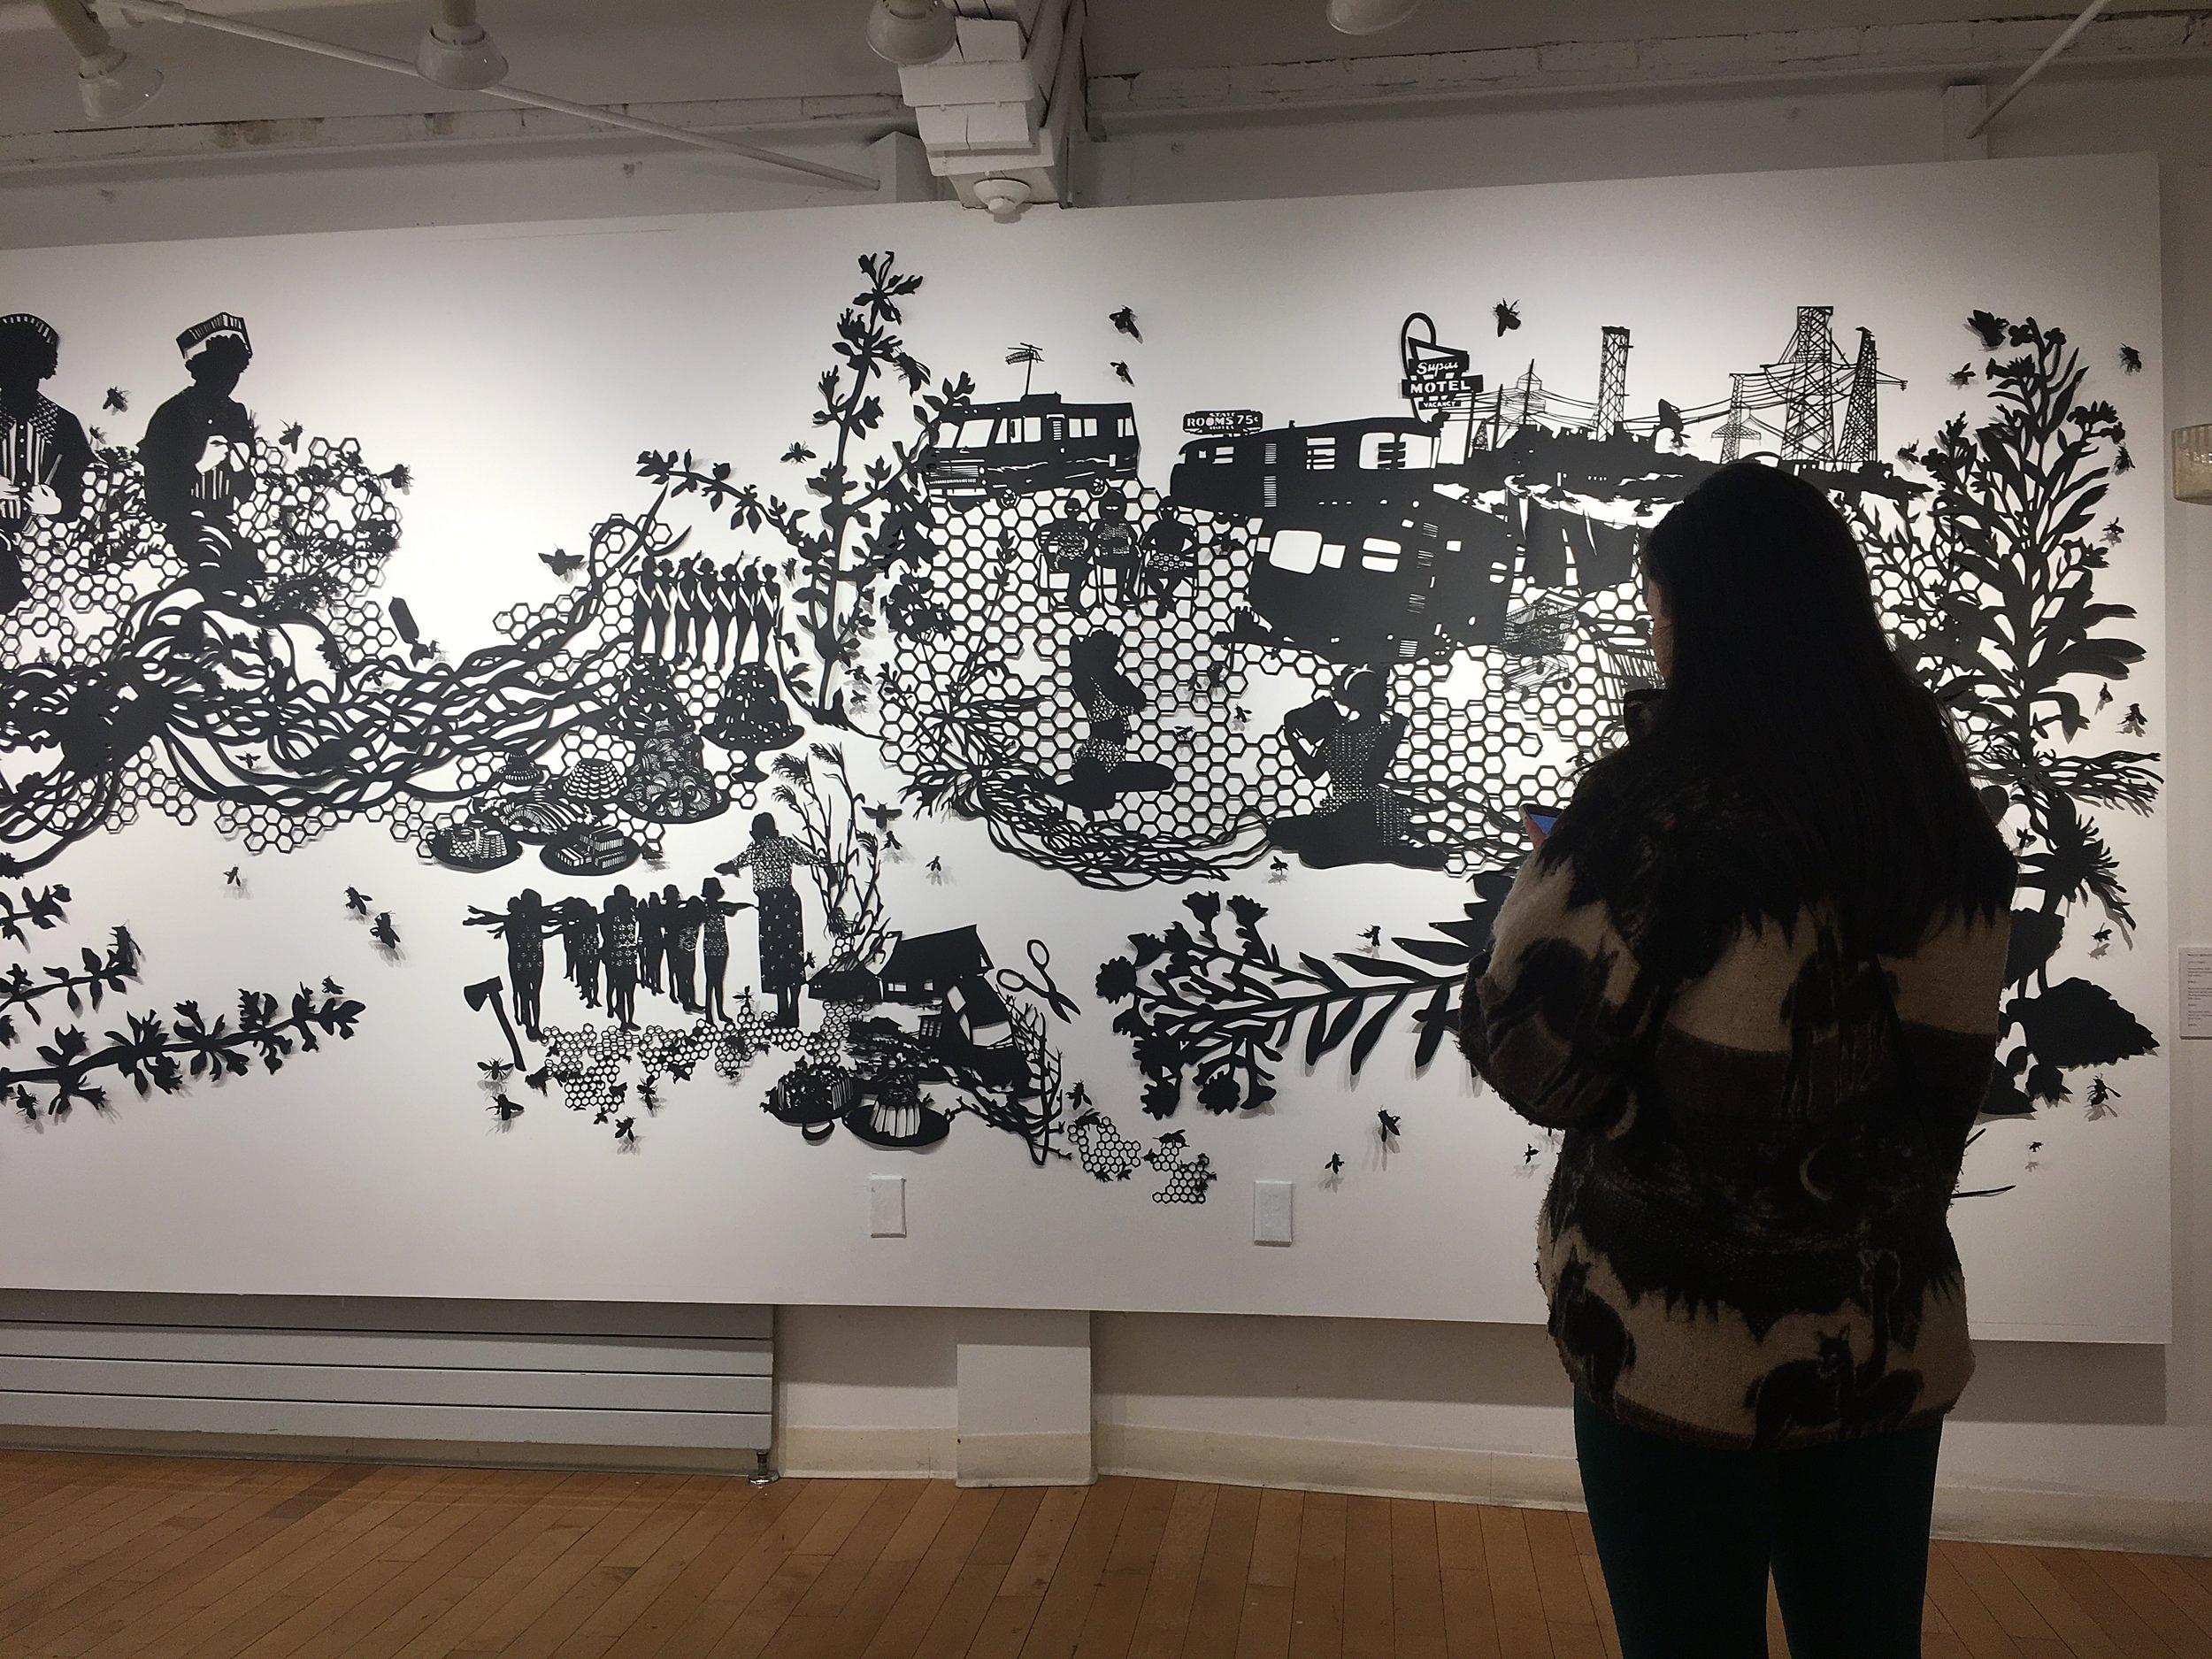 The Metro Gallery at Burlington City Arts in Burlington, VT